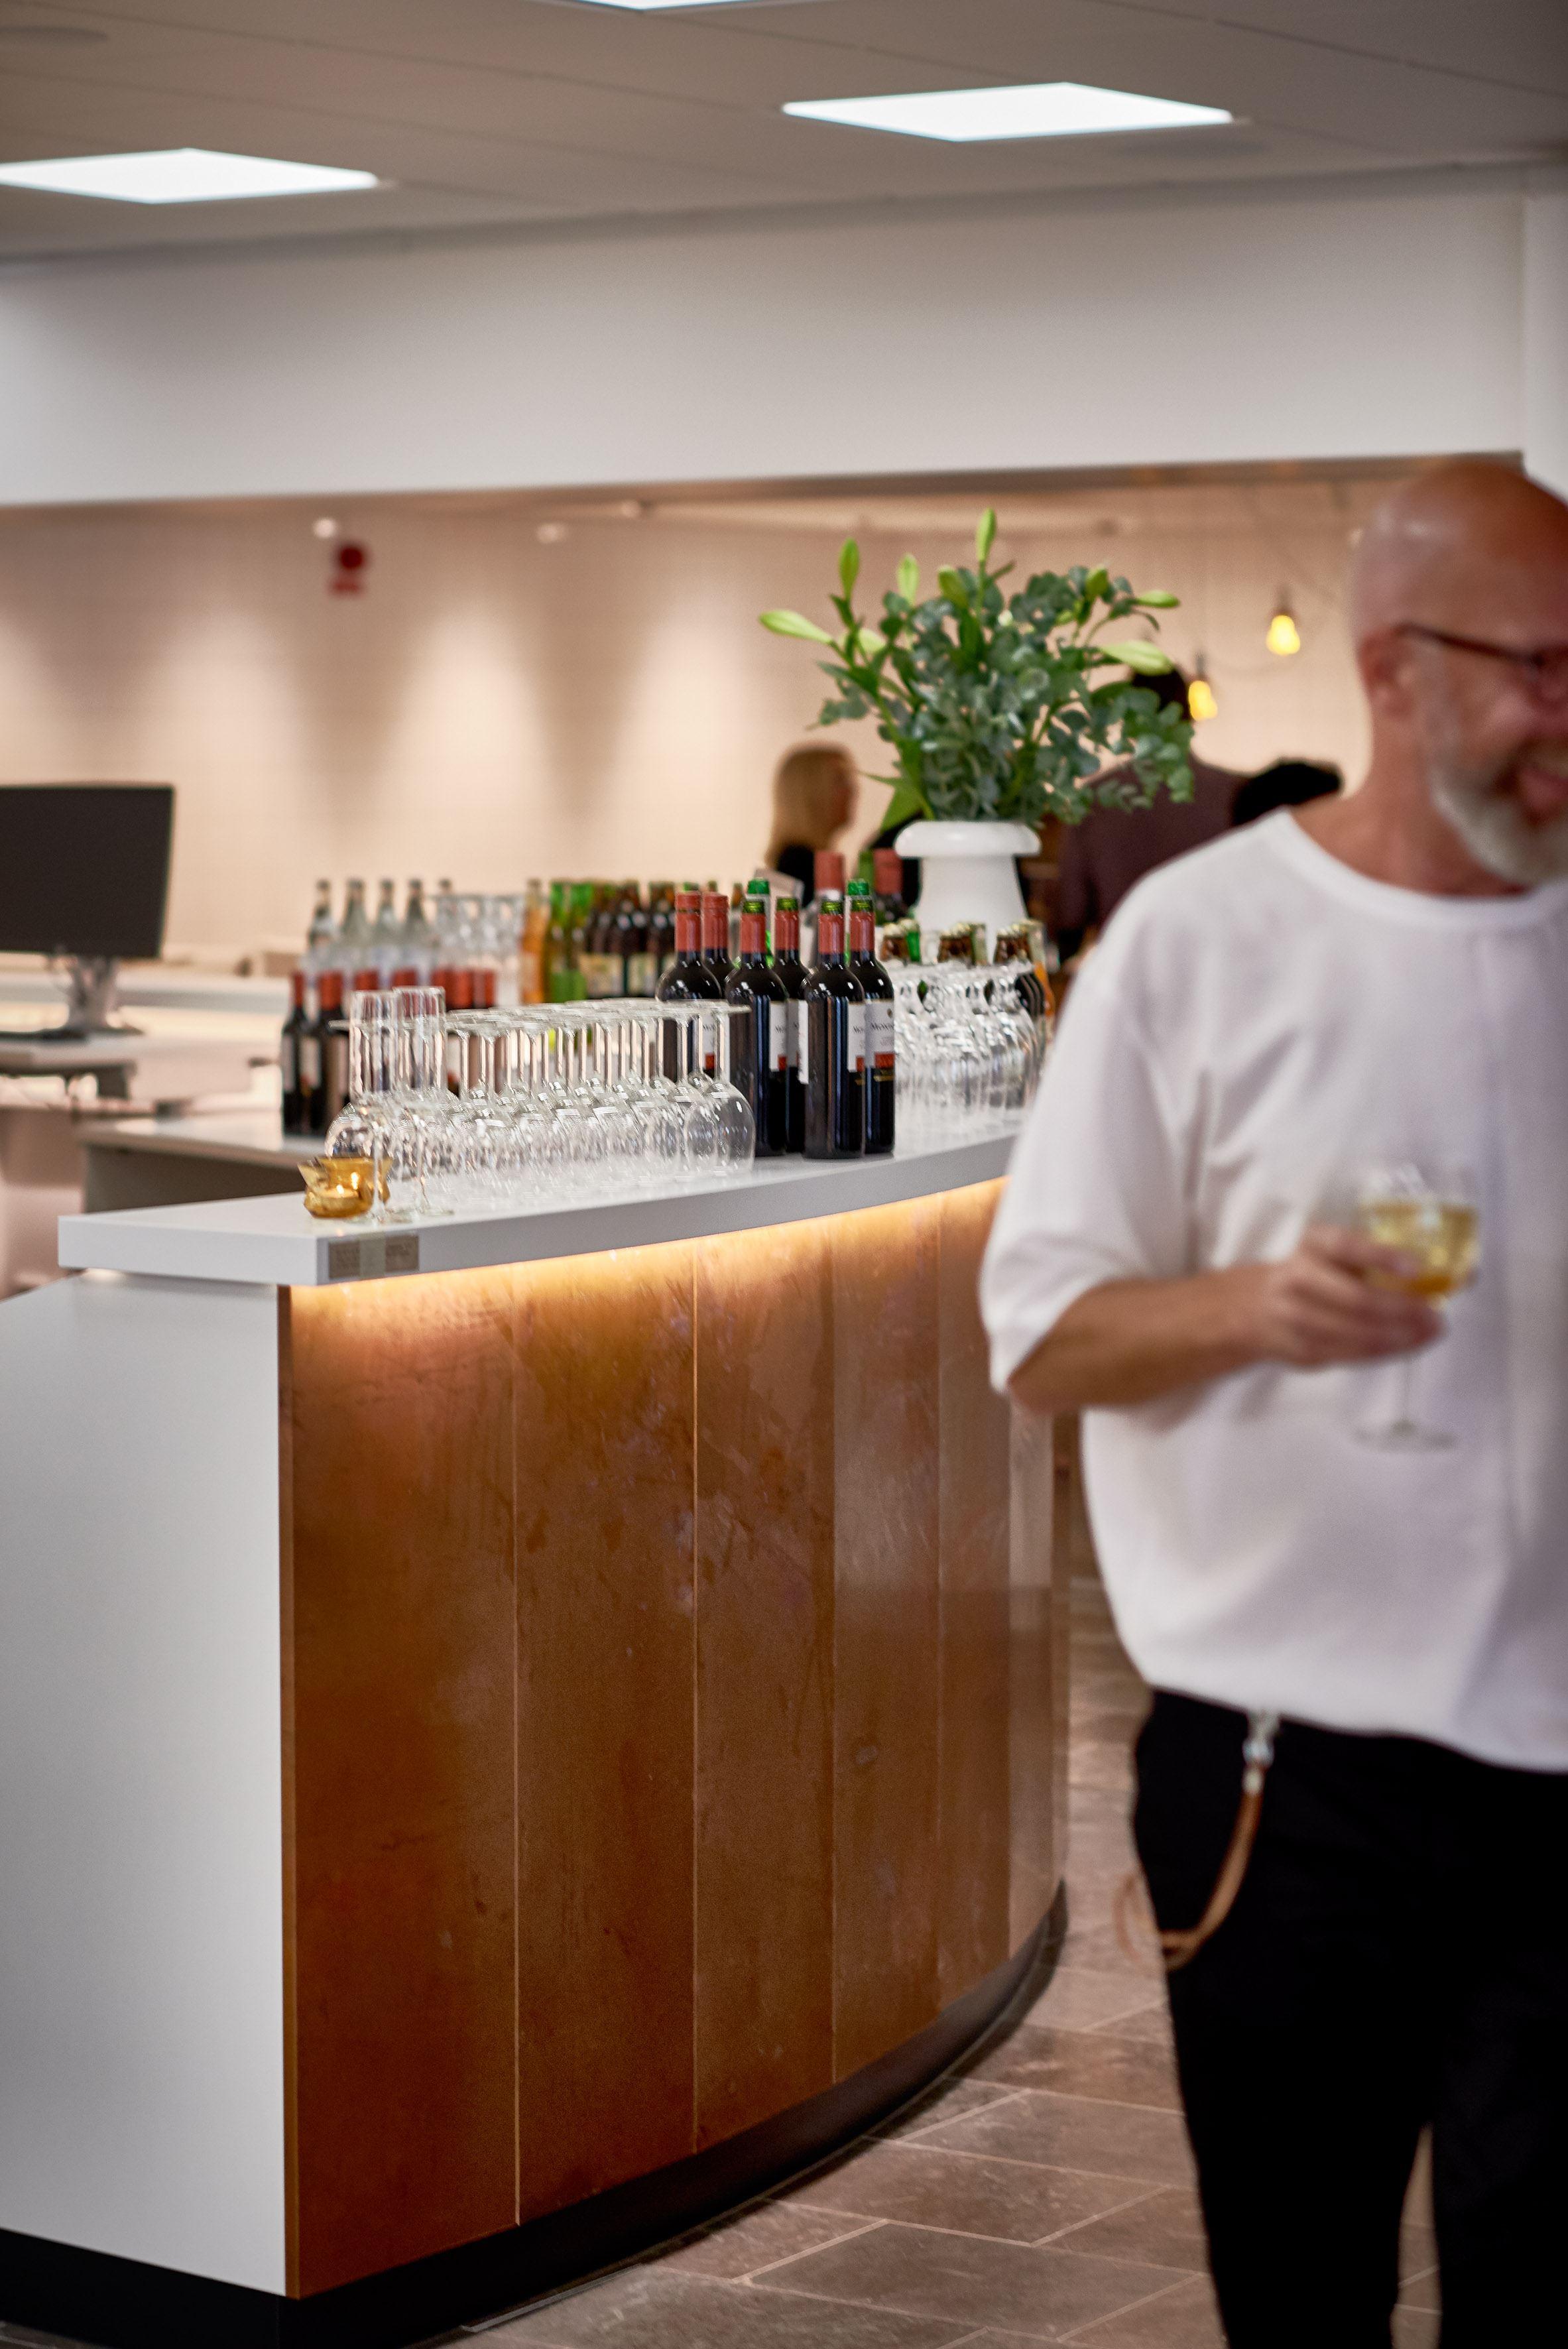 IKEA Hotell Restaurant